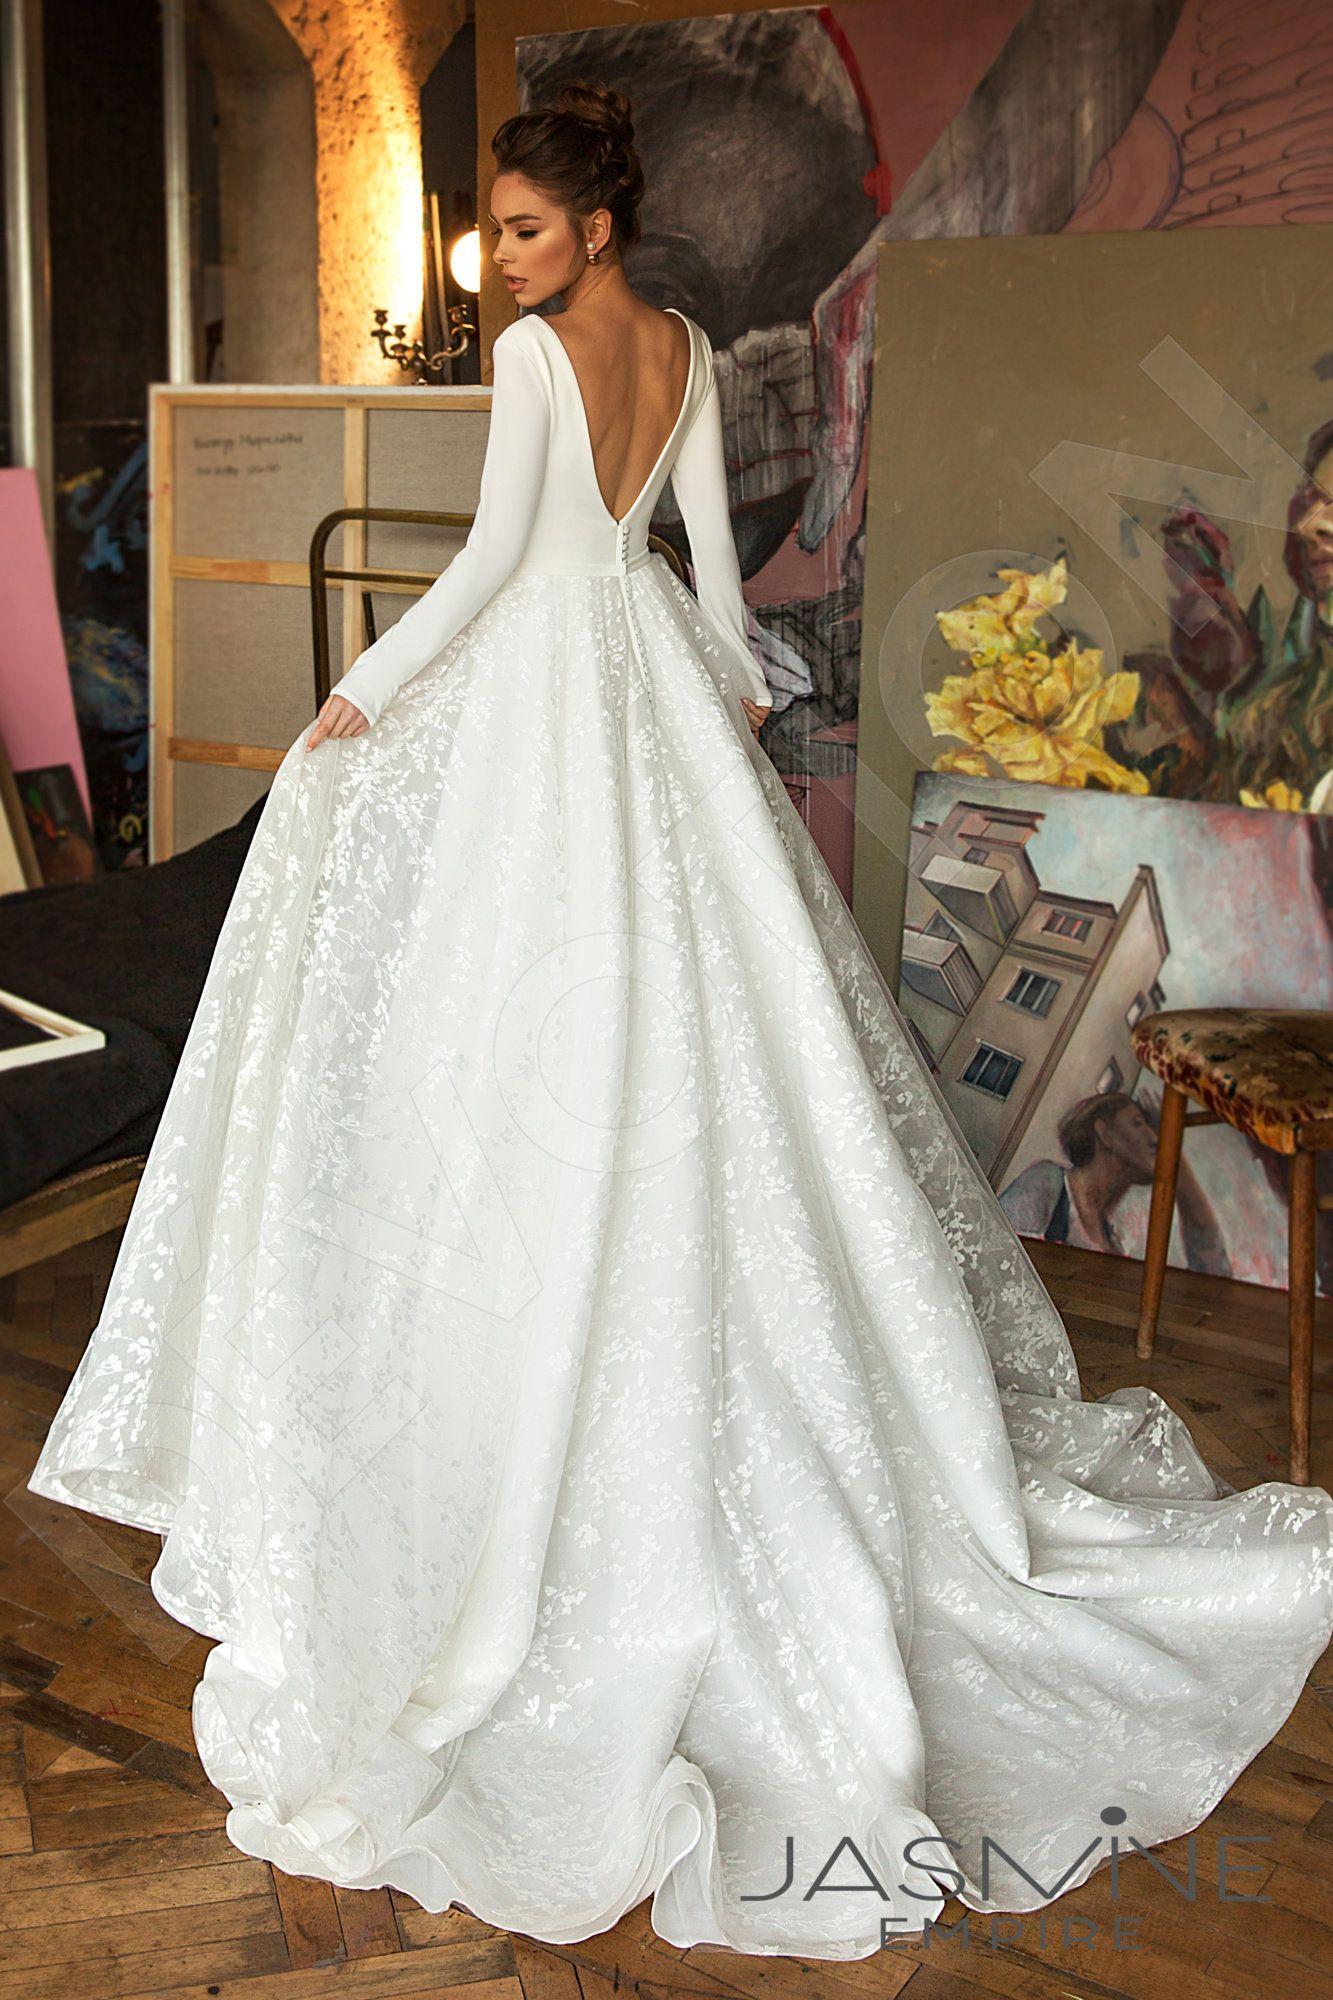 Tamaño individual A-línea silueta Bonna vestido de novia. | Etsy